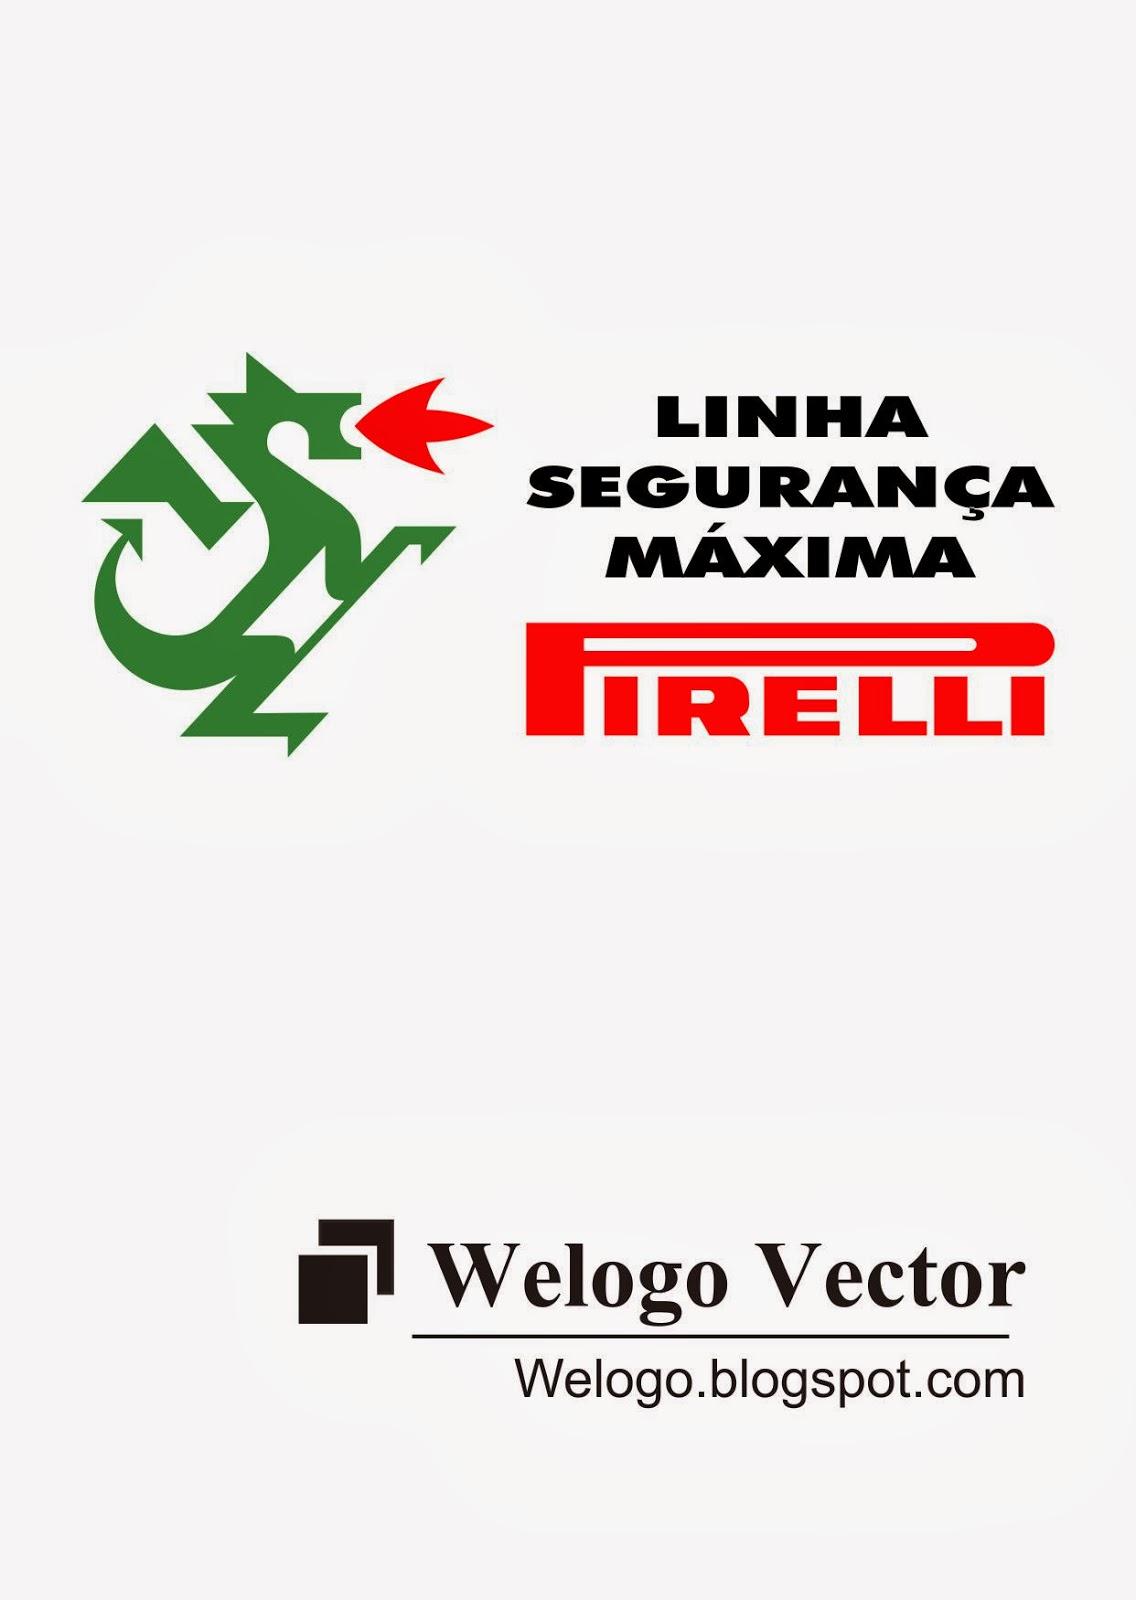 LINHA SEGURANCA MAXIMA PIRELLI LOGO